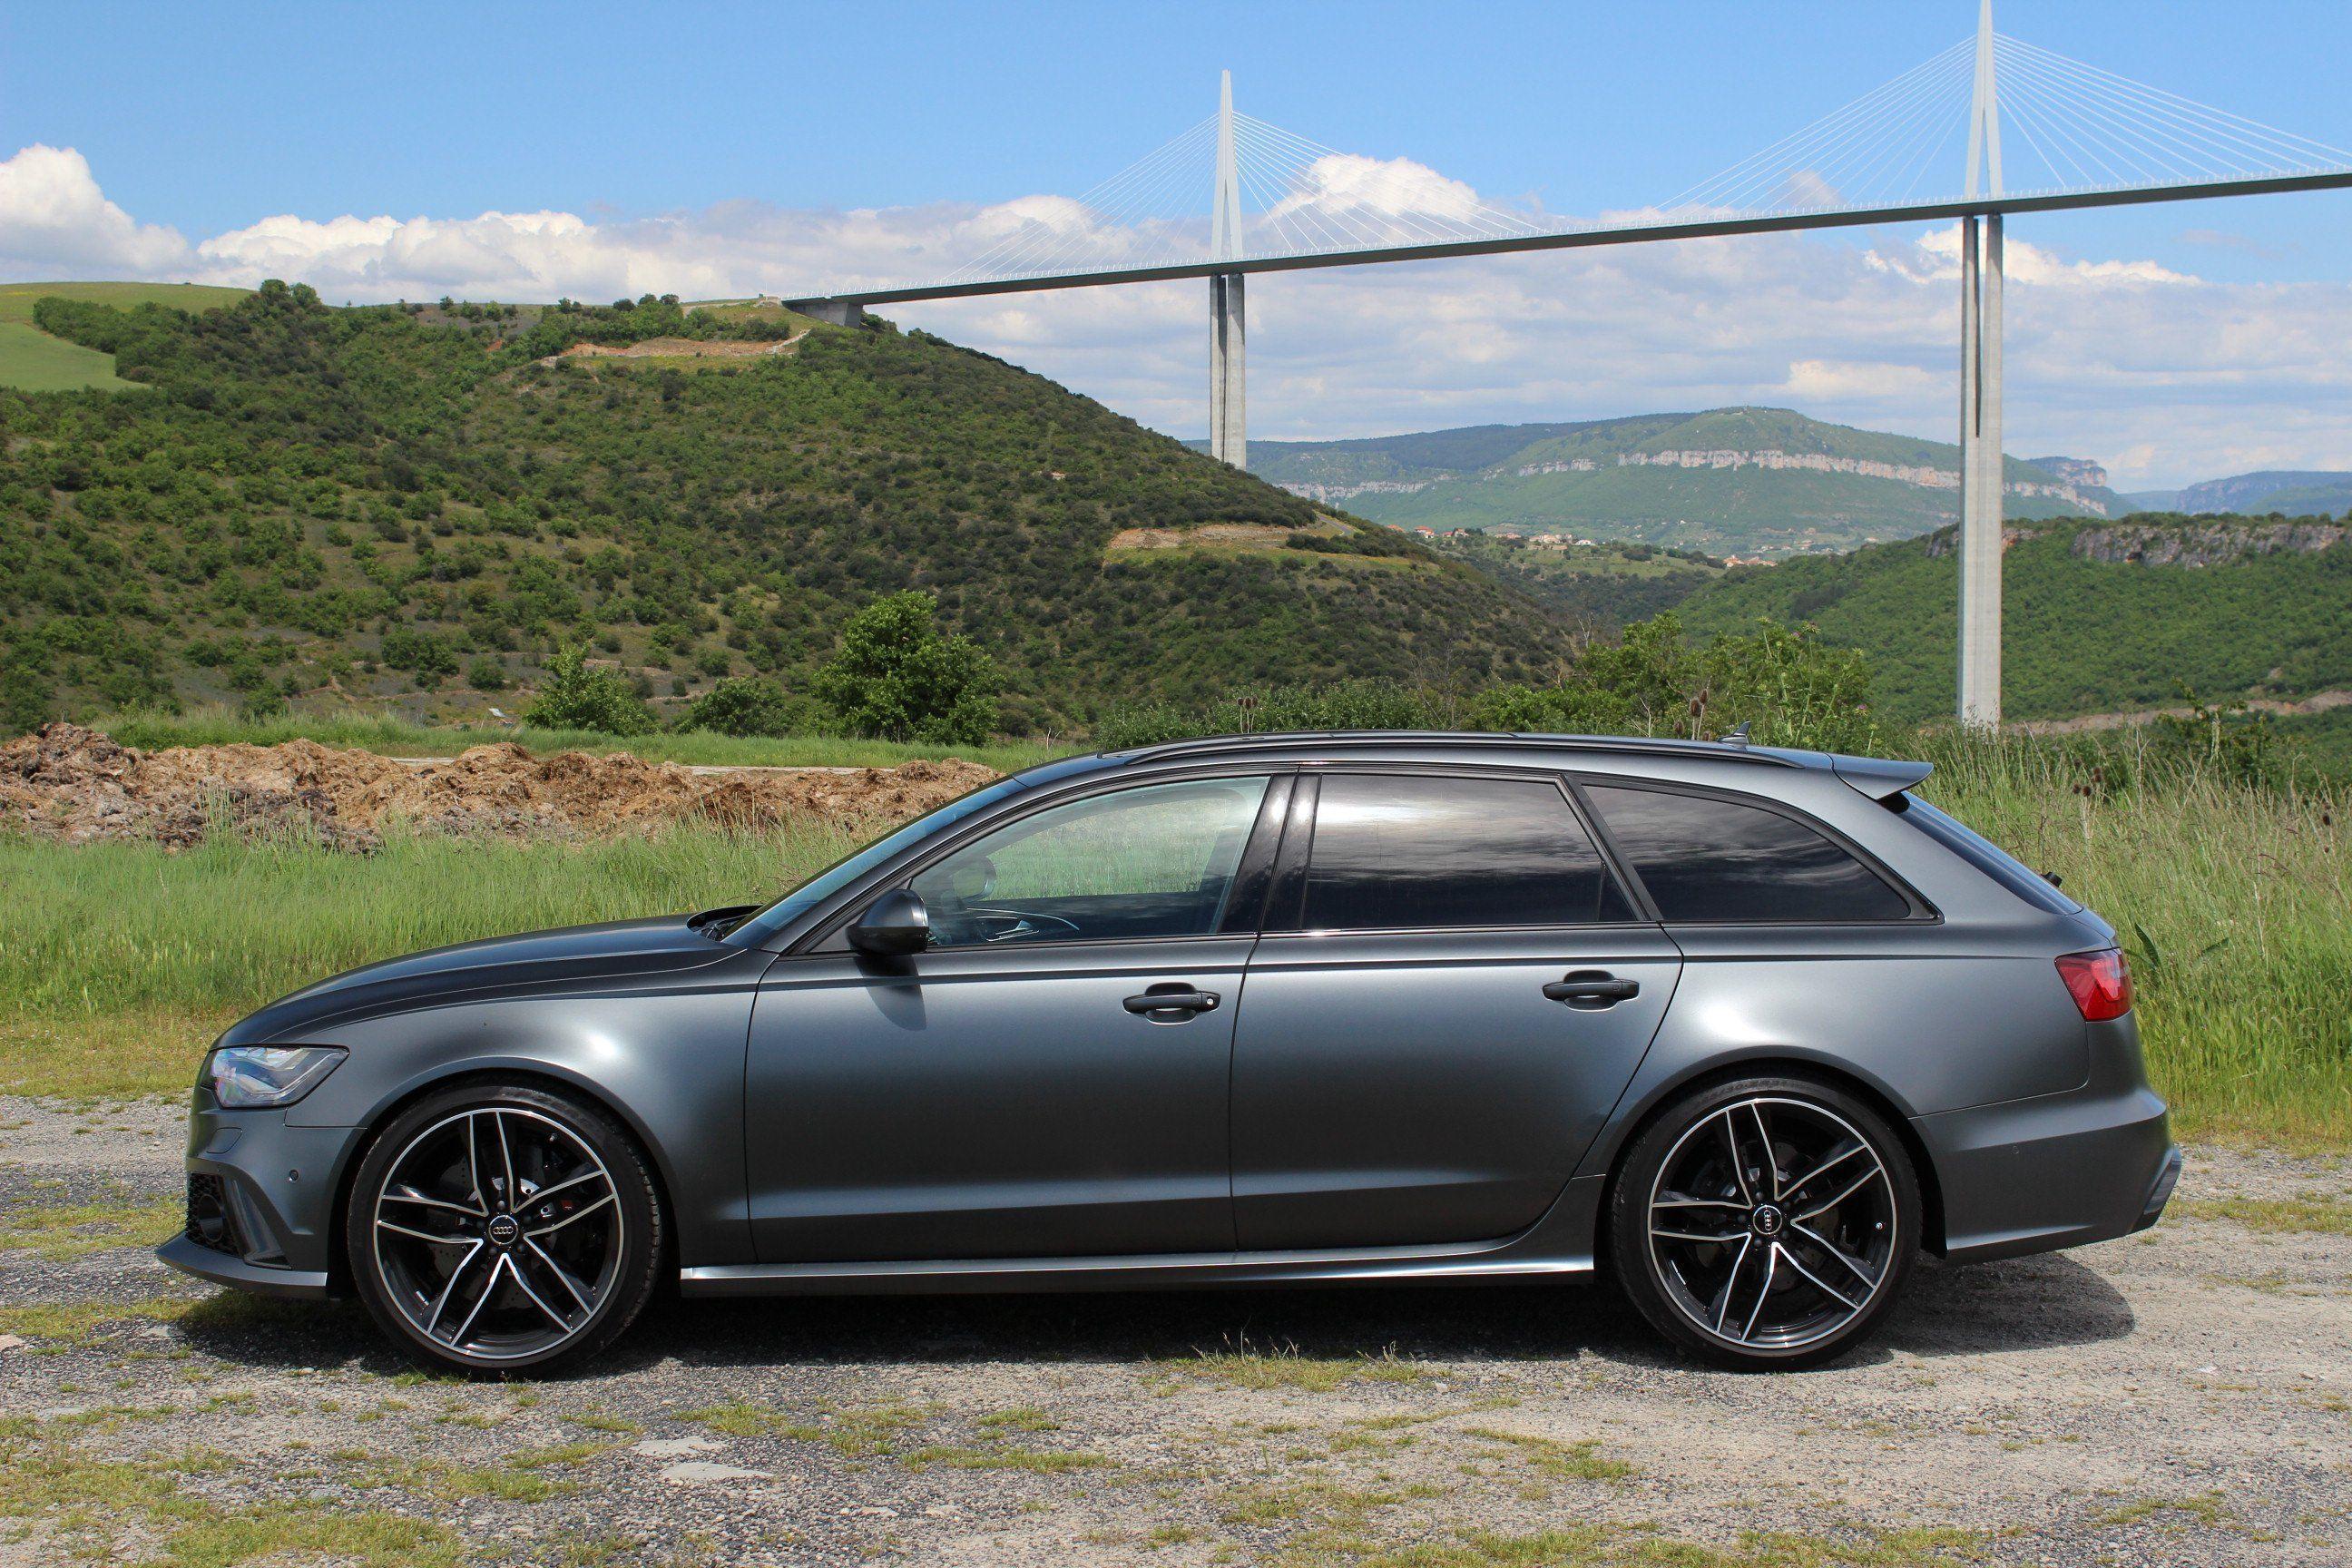 2014 Audi Rs6 Black Audi Rs6 Avant 2013 Wallpaper Background ...